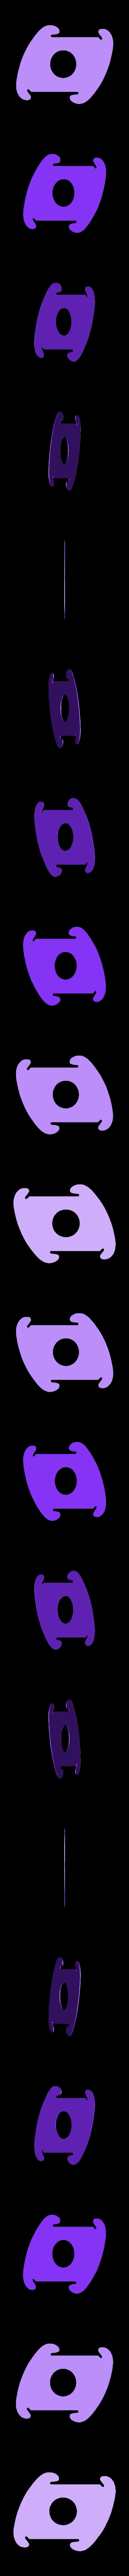 jigsaw_puzzel_lamp_met_gat_voor_lamp_10_cm.stl Download free STL file Jigsaw Puzzel Lamp with hole for standard • 3D printable template, Vishell